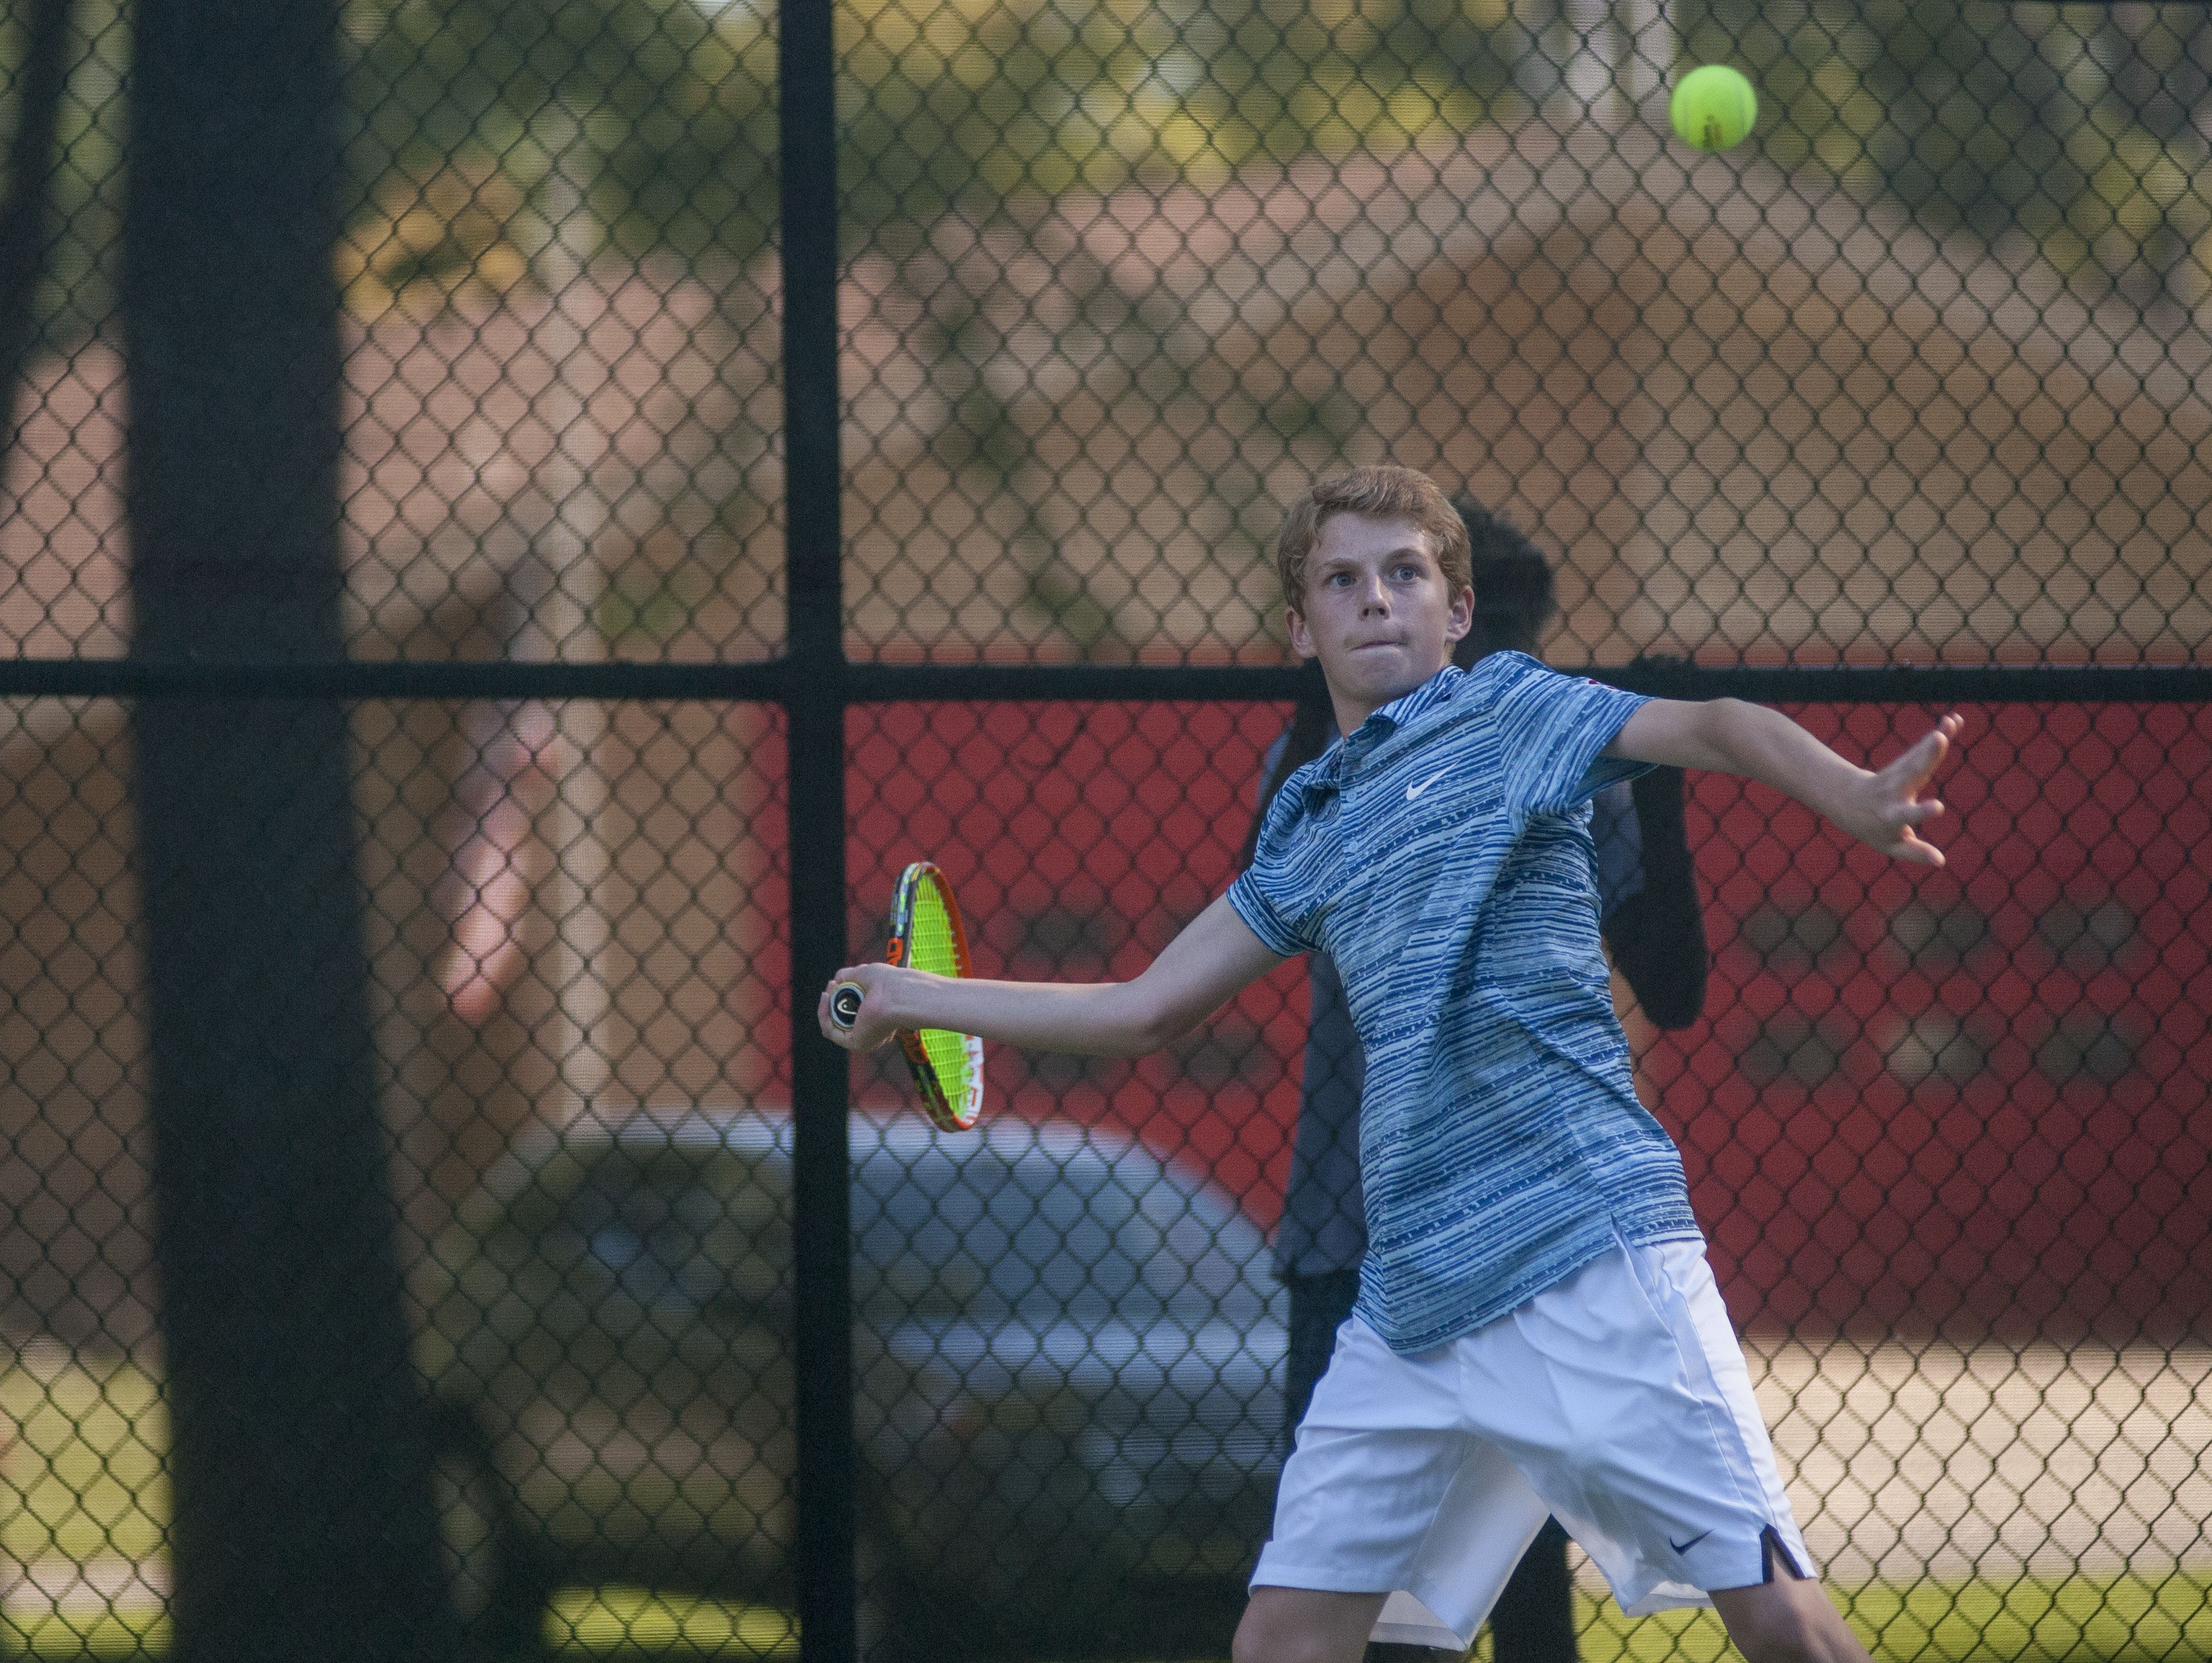 Saints' Eli Pinnoo keeps his eyes on the ball Monday, Sept. 12, during boys tennis action at Sanborn Park tennis courts.